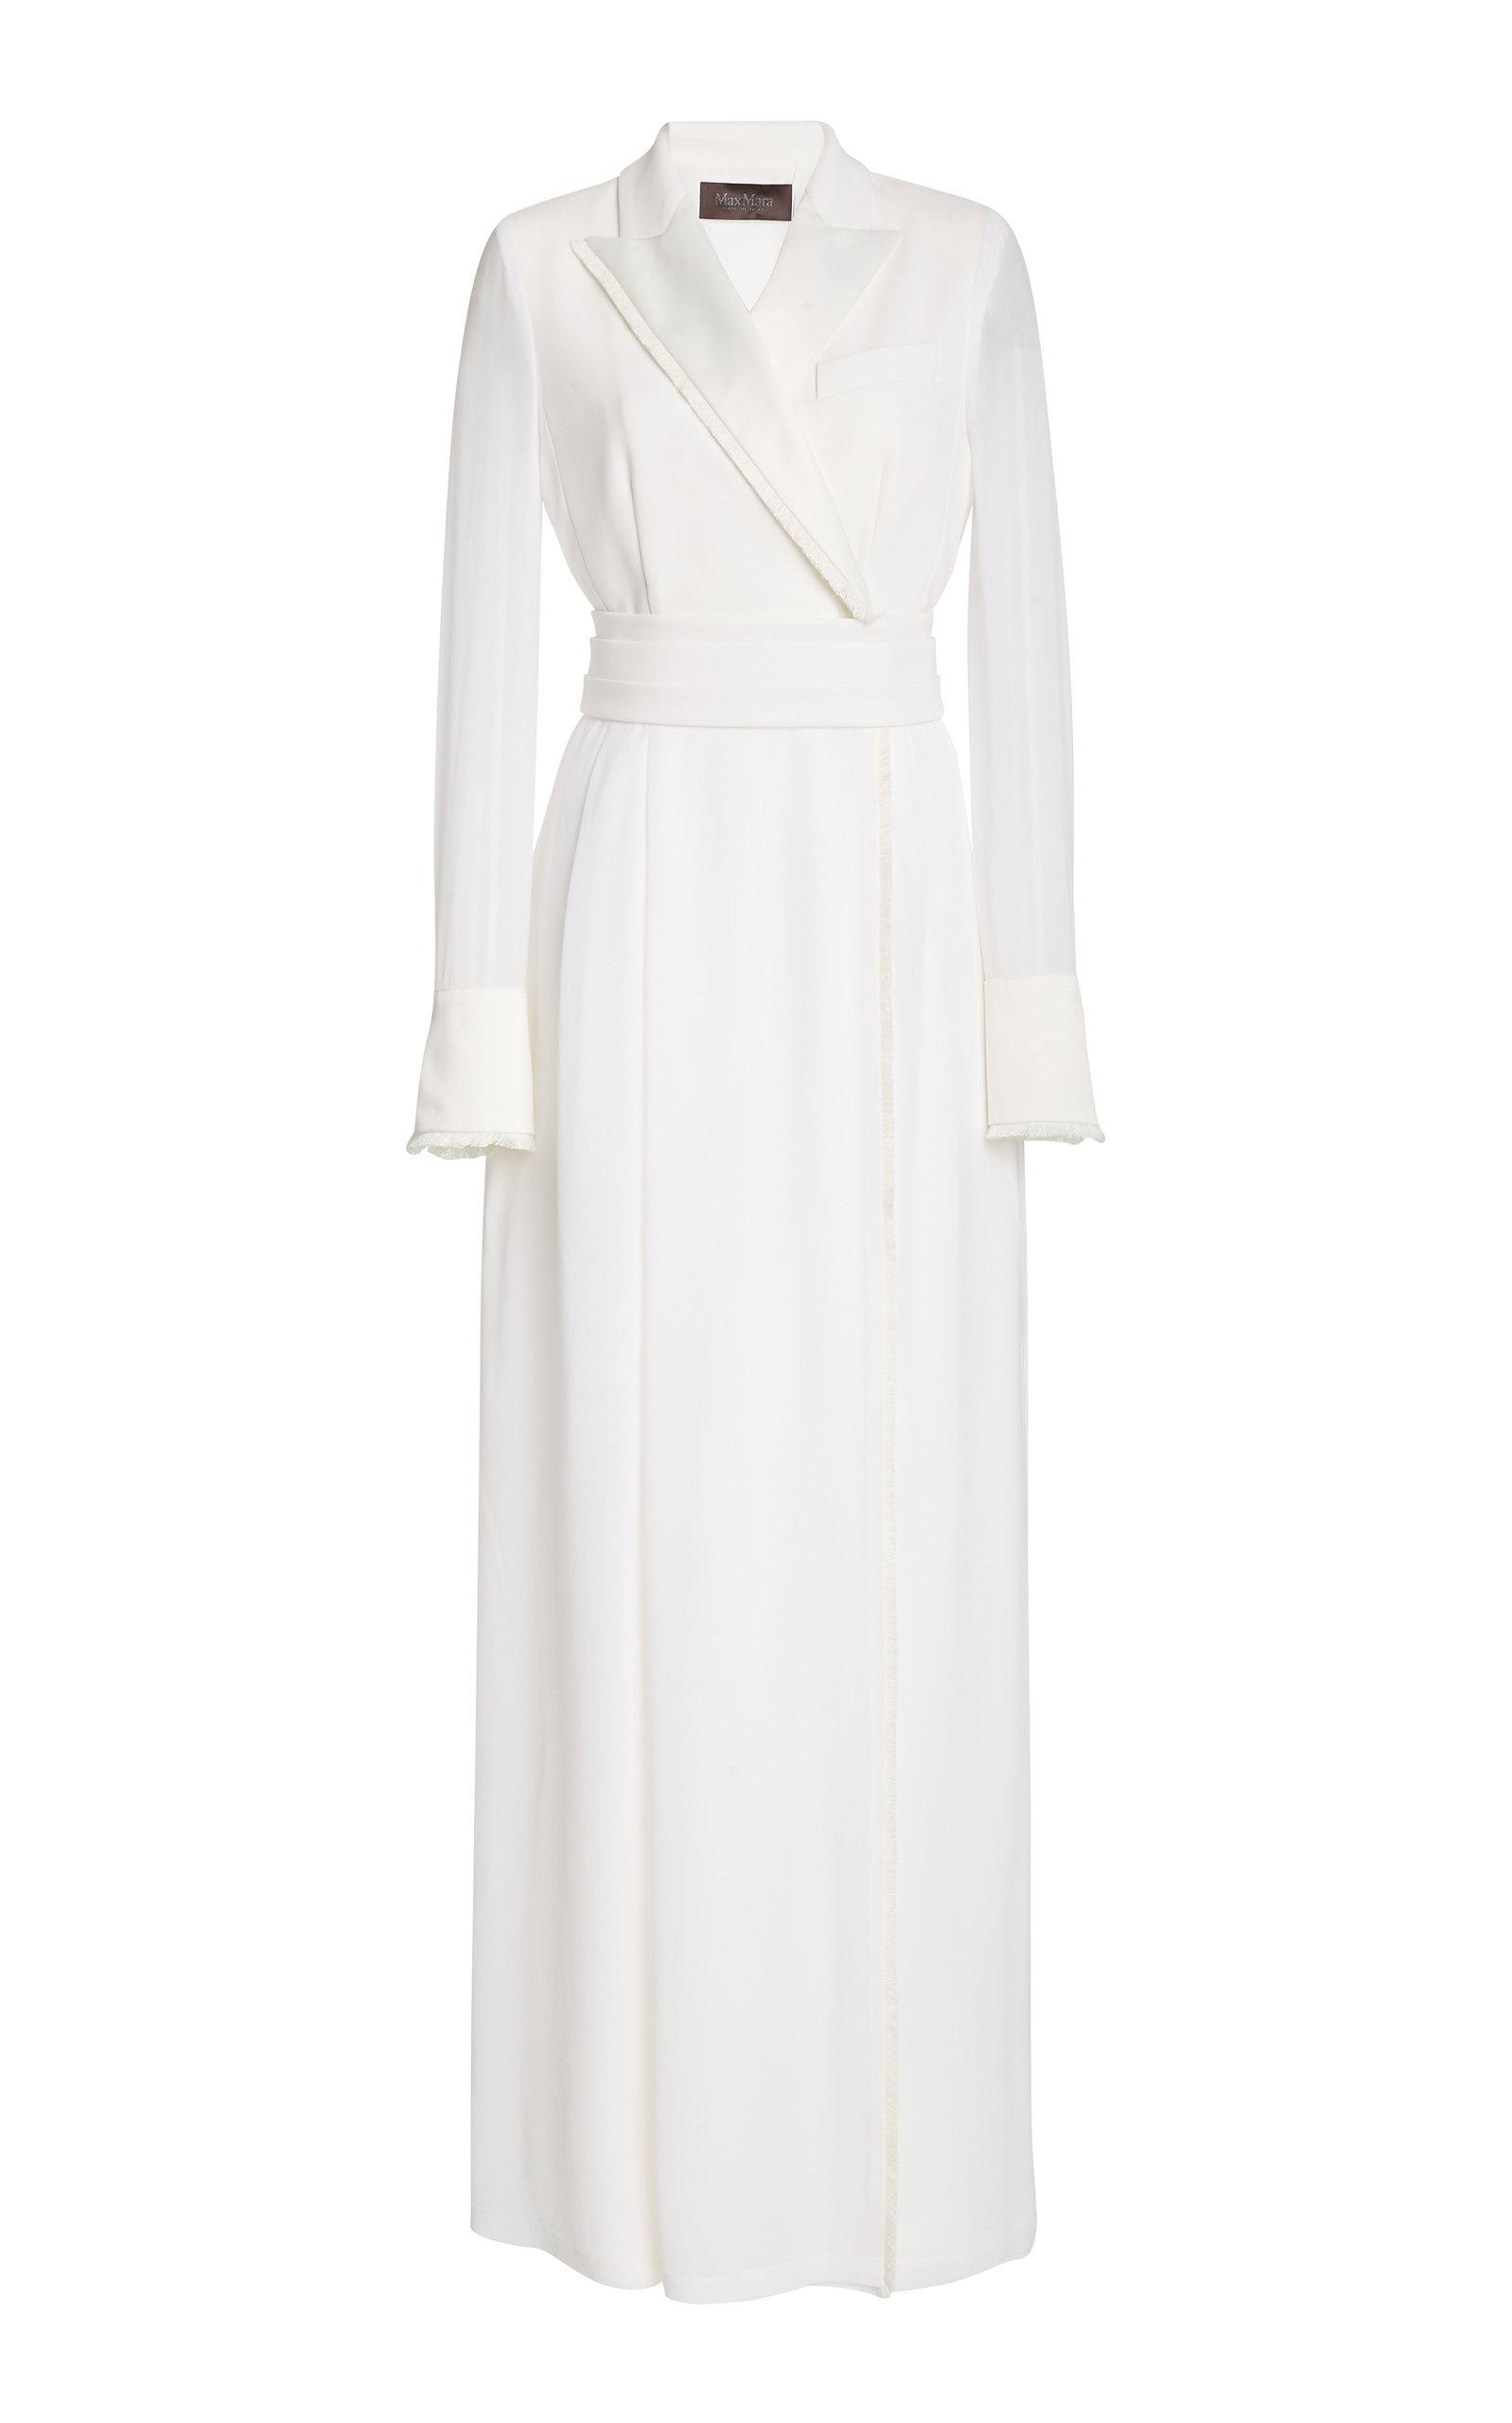 Buy Max Mara Gemma Crepe And Chiffon Dress online, shop Max Mara at the best price